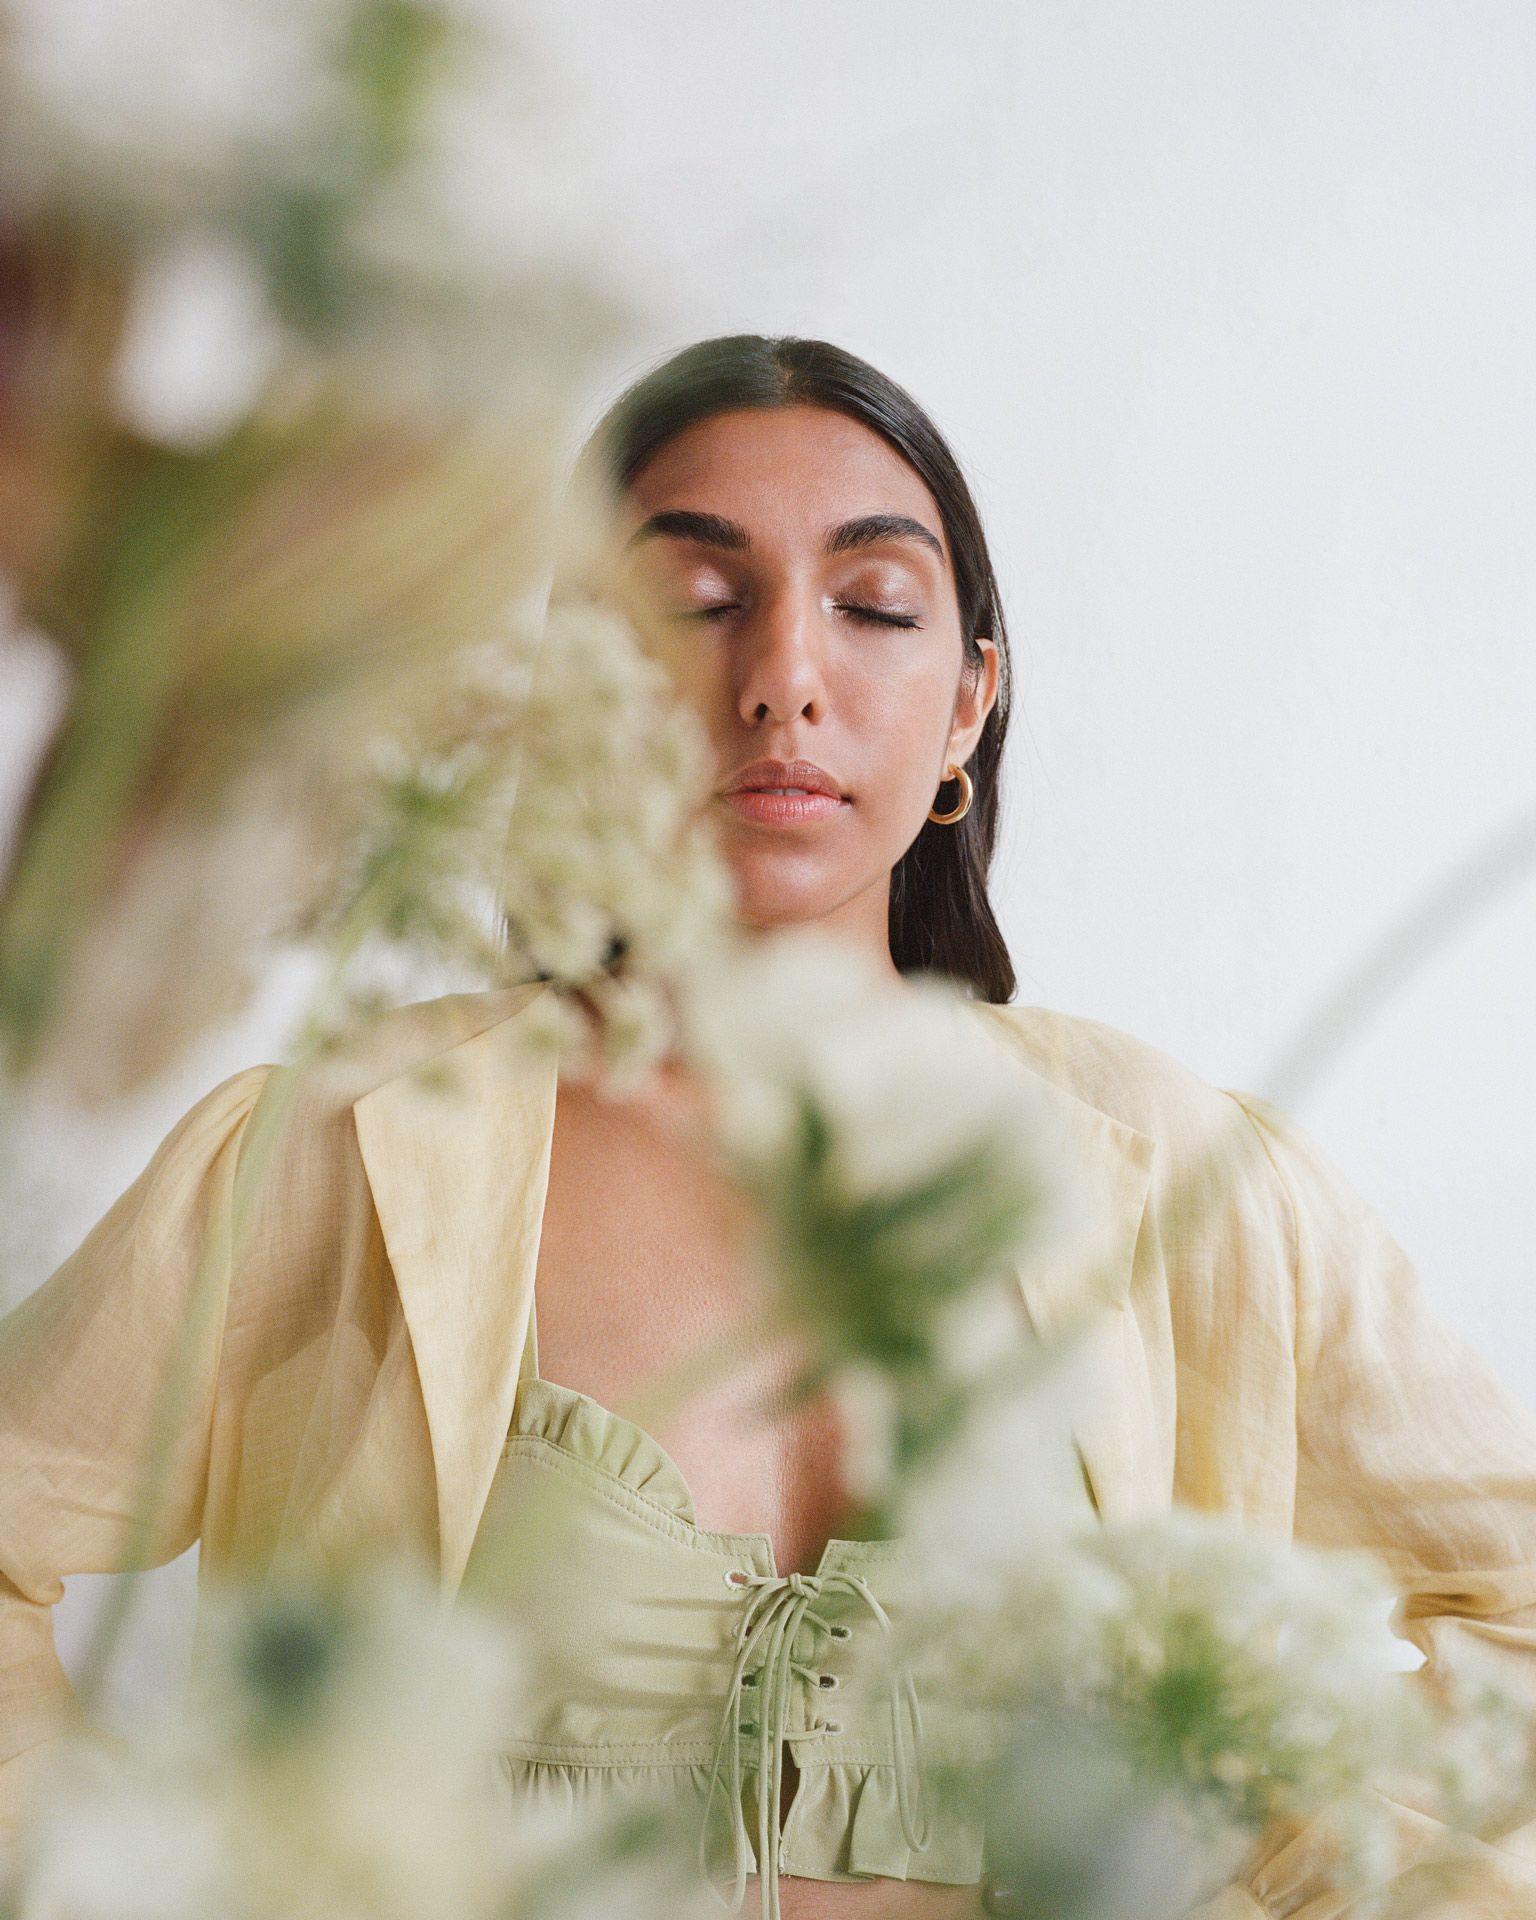 writer Rupi Kaur eyes closed behind plants by Oumayma B Tanfous for Vogue Espana